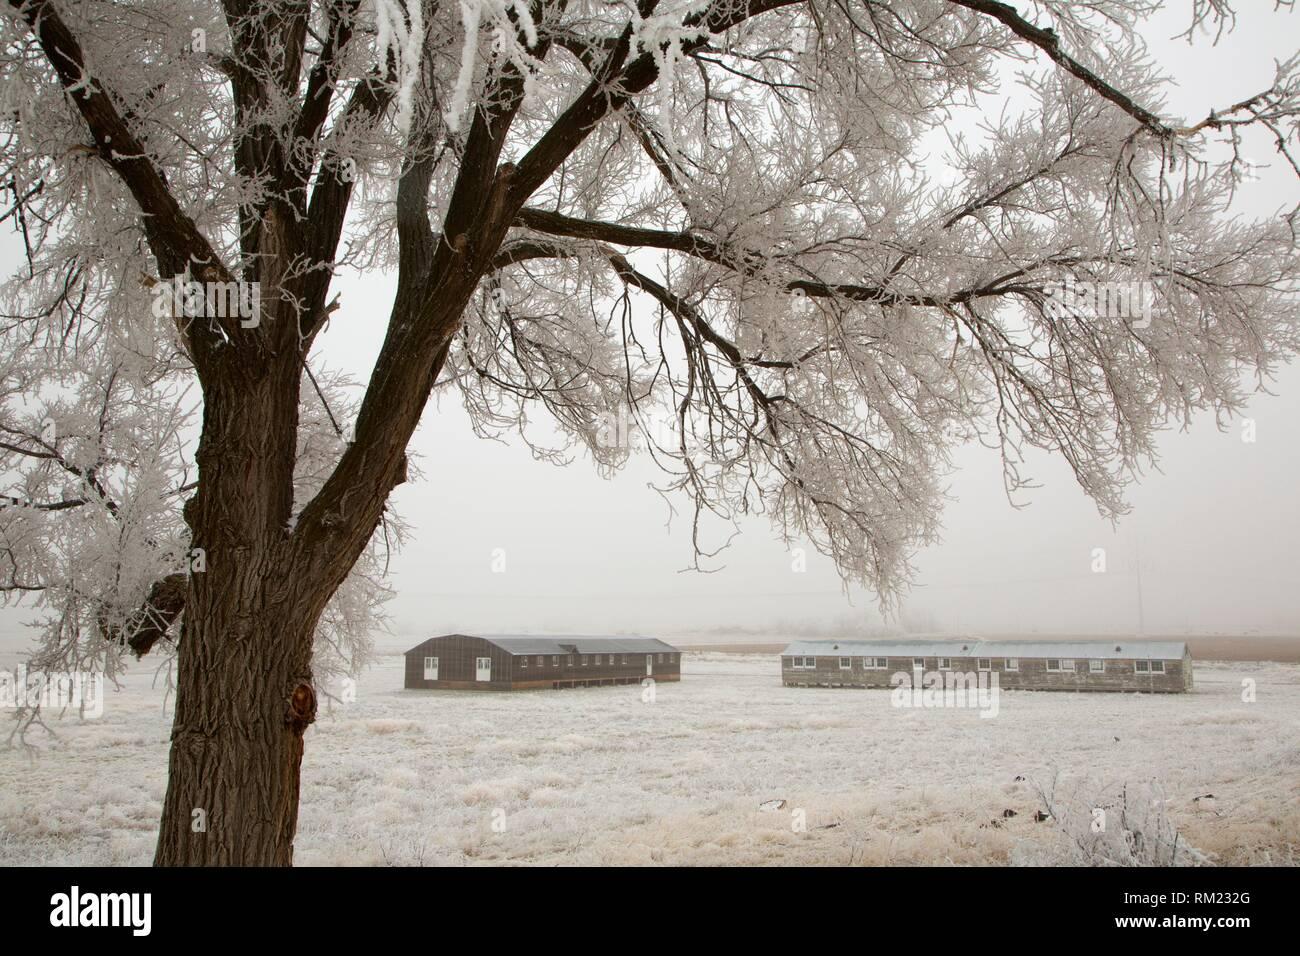 Lebendige Kaserne und Mess Hall, Minidoka National Historic Site, Idaho. Stockfoto